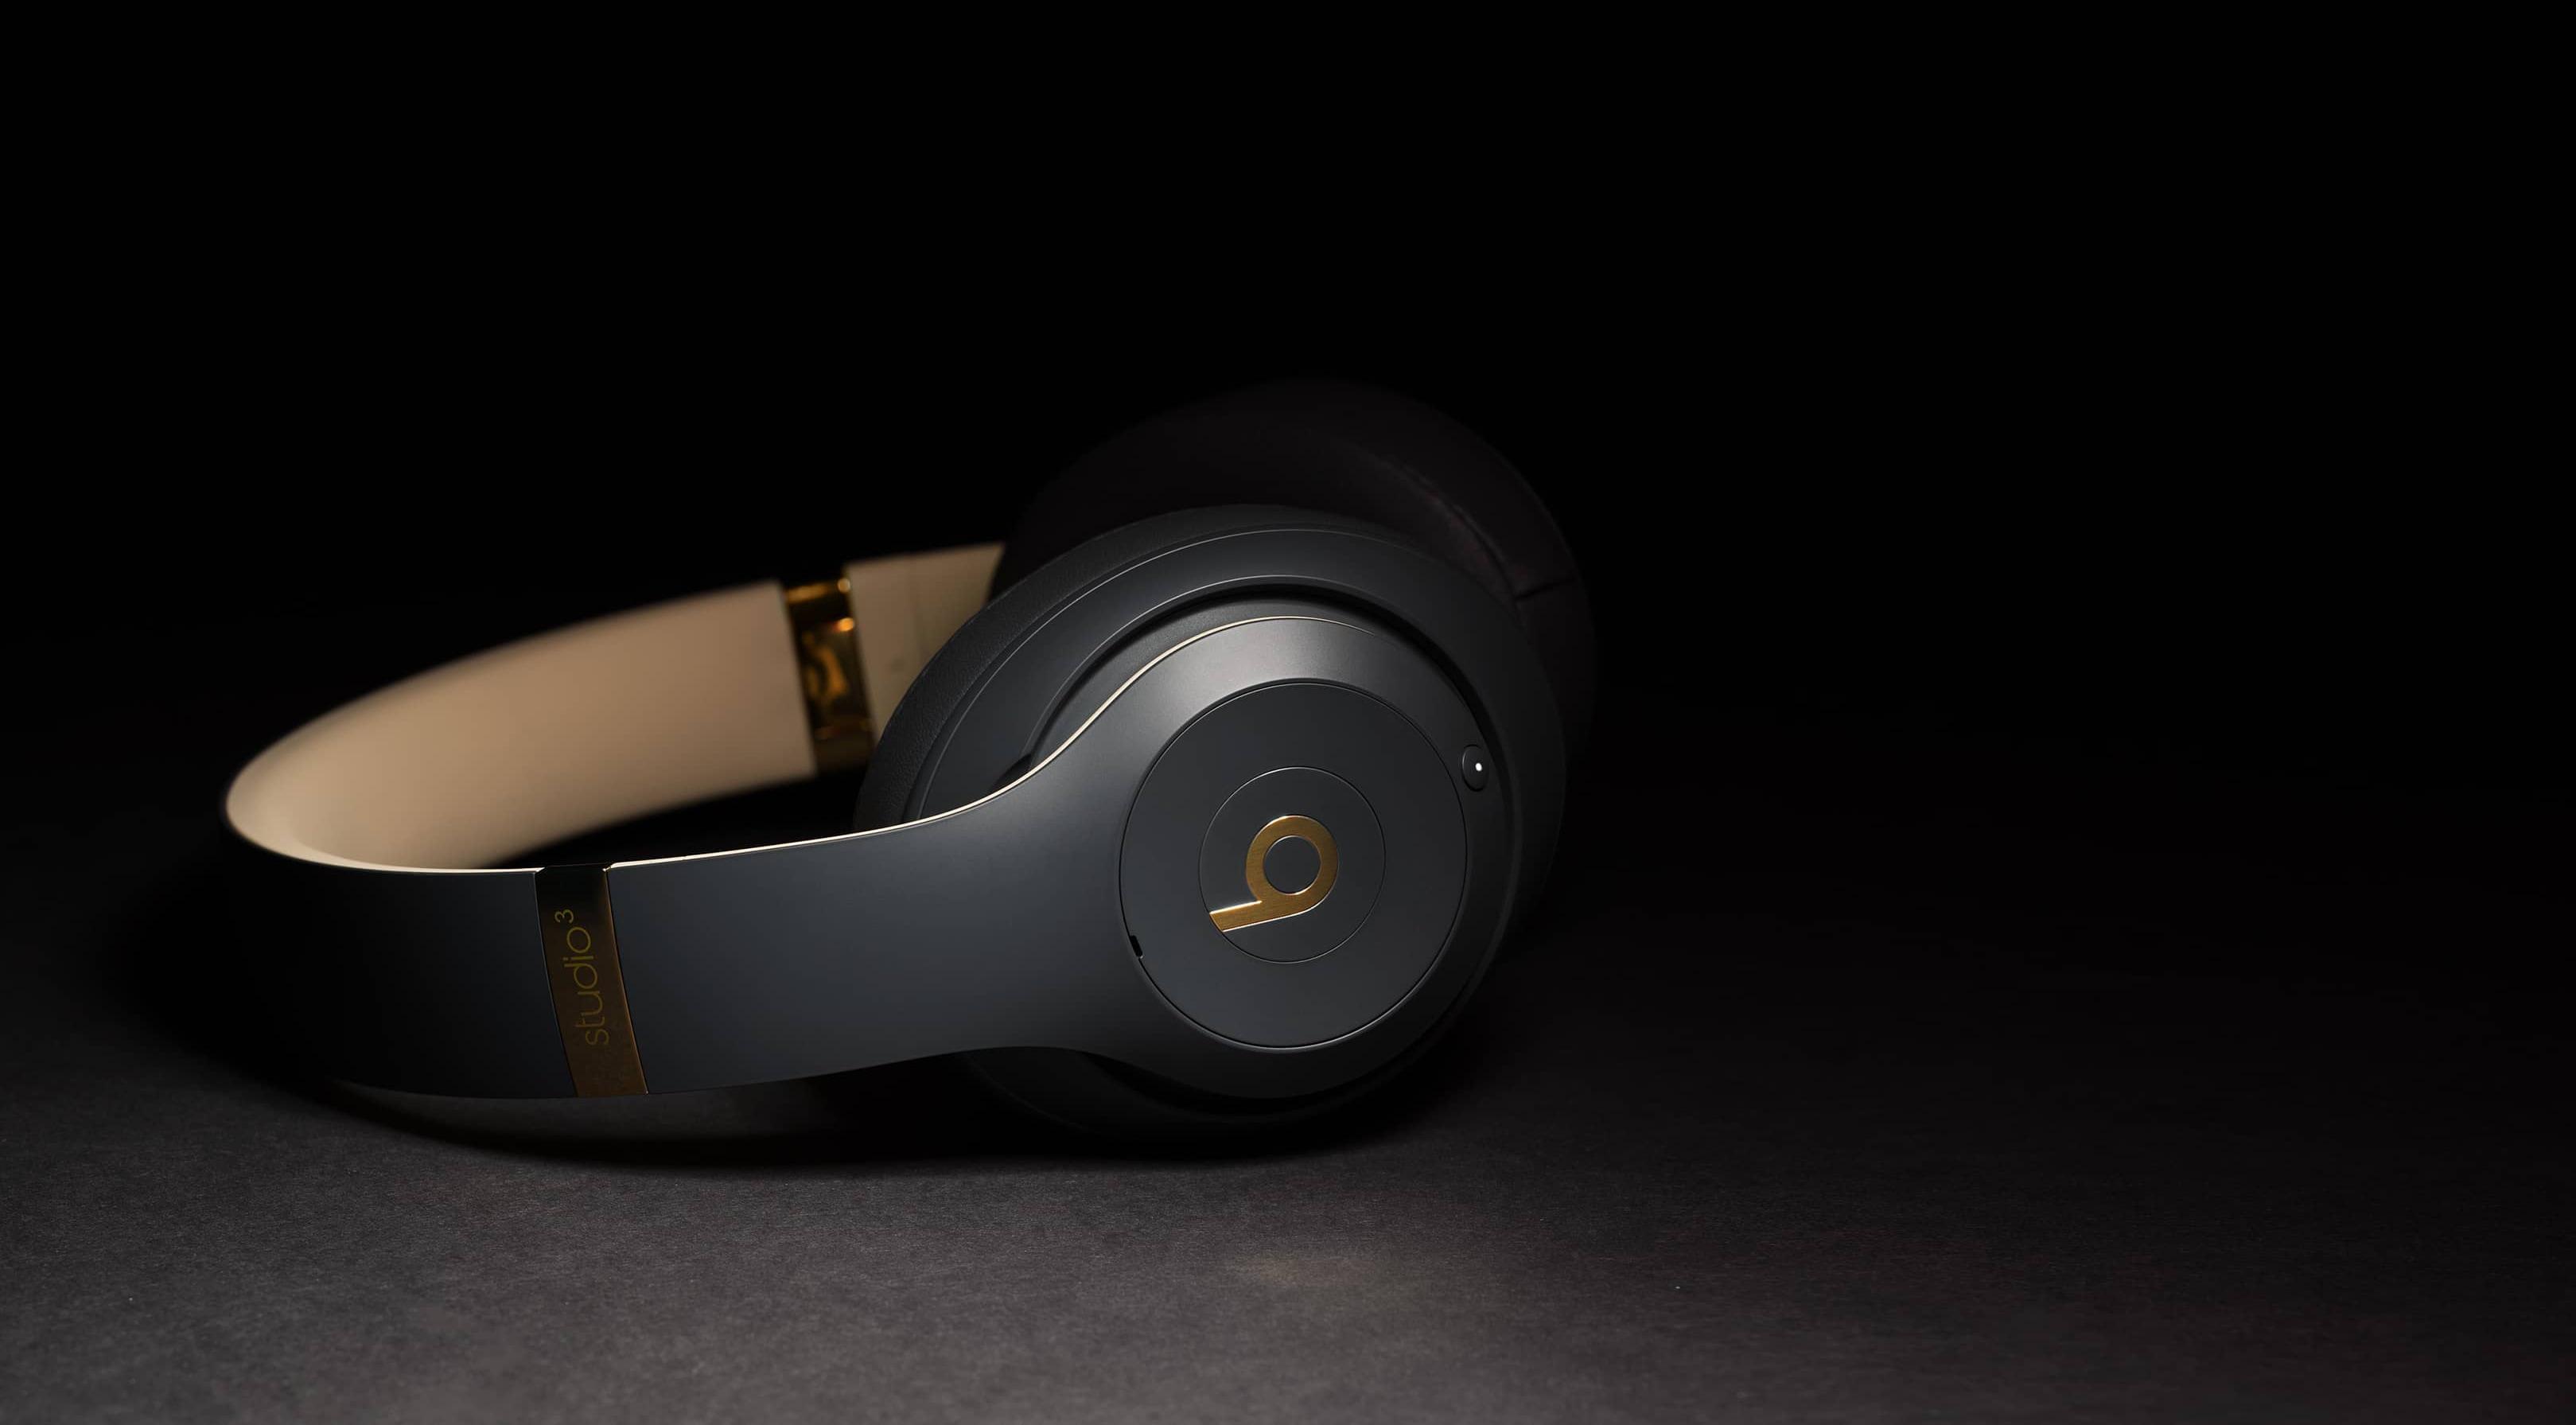 Foto promocional dos fones Beats Studio3 Wireless